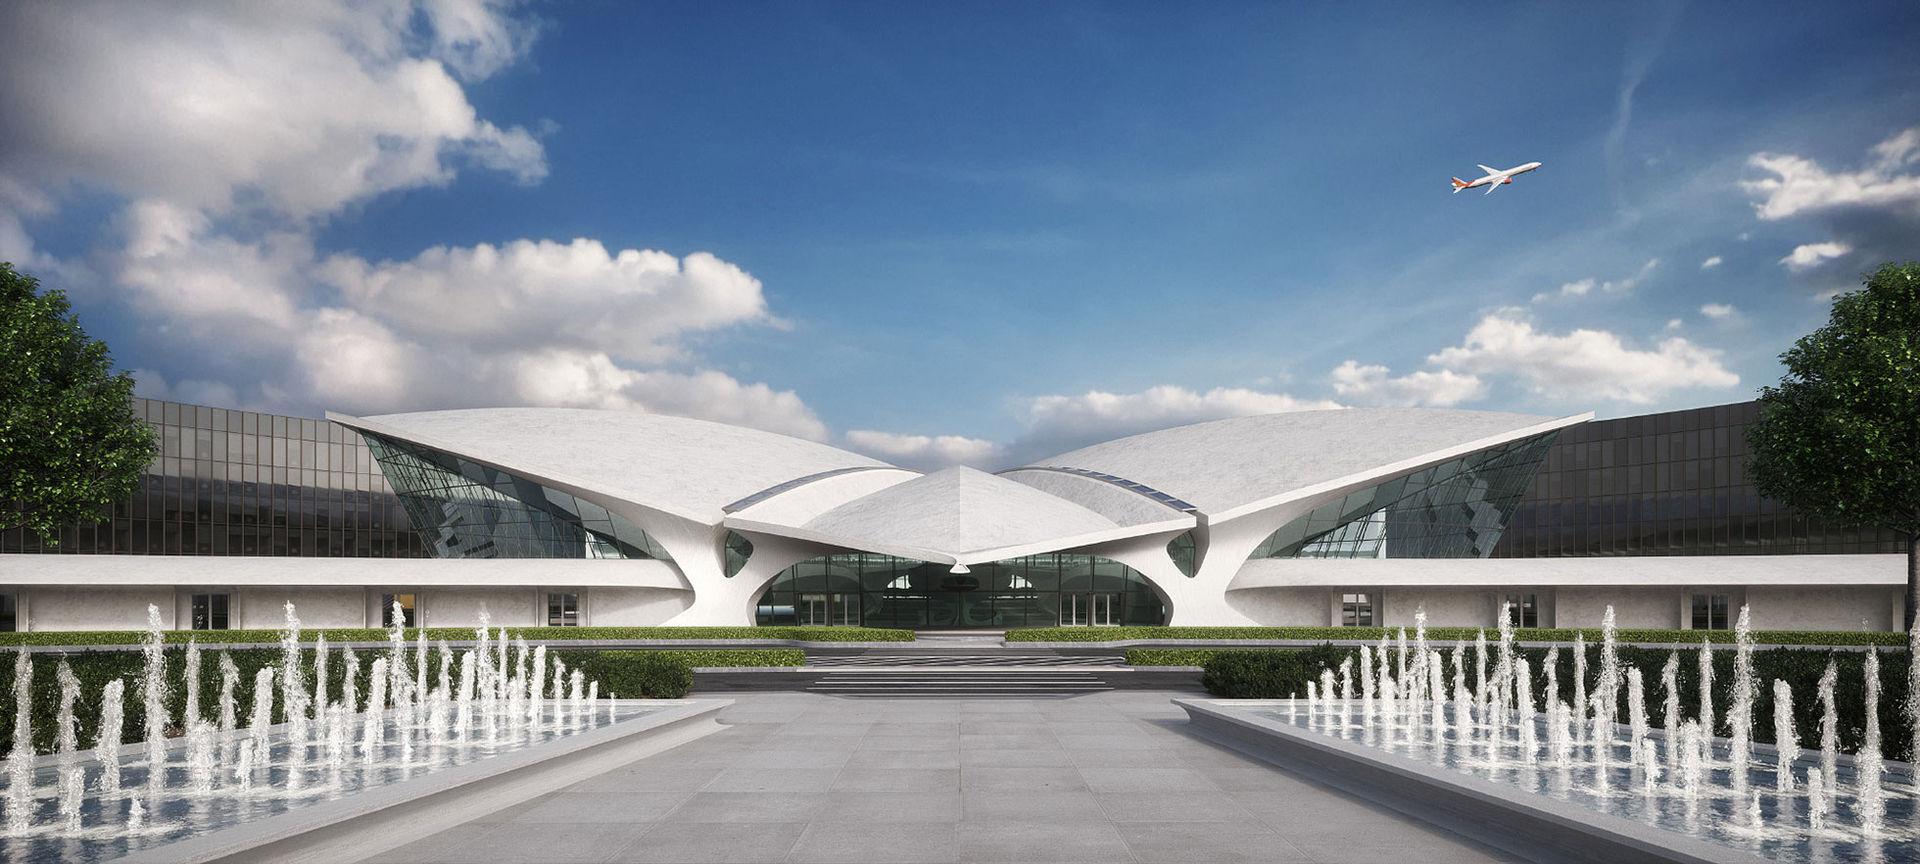 Klassisk terminal i New York byggs om till hotell